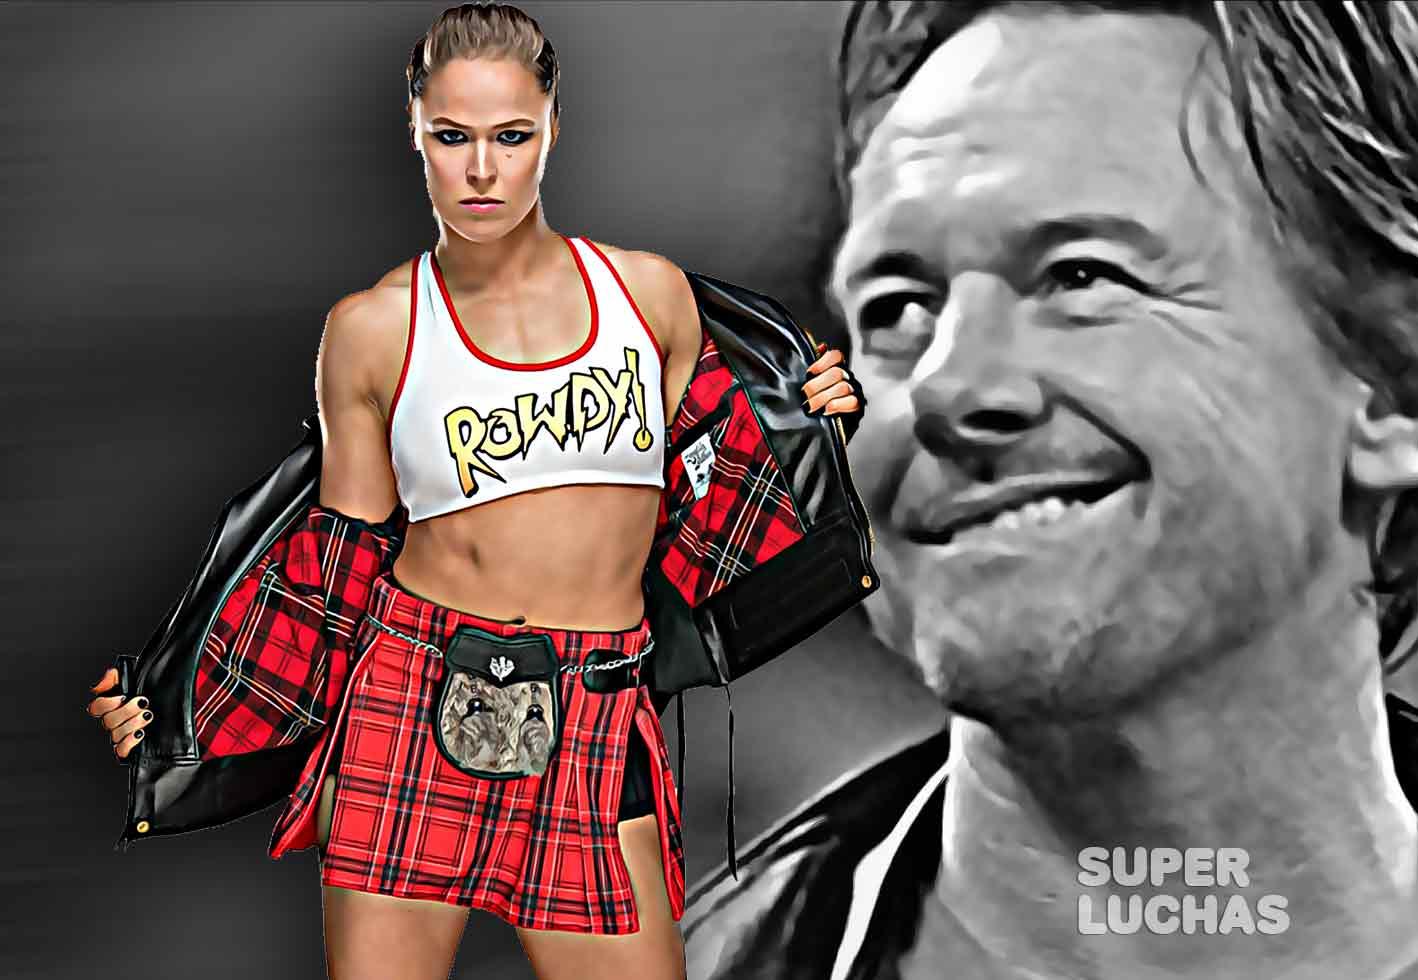 Ronda Rousey Roddy Piper